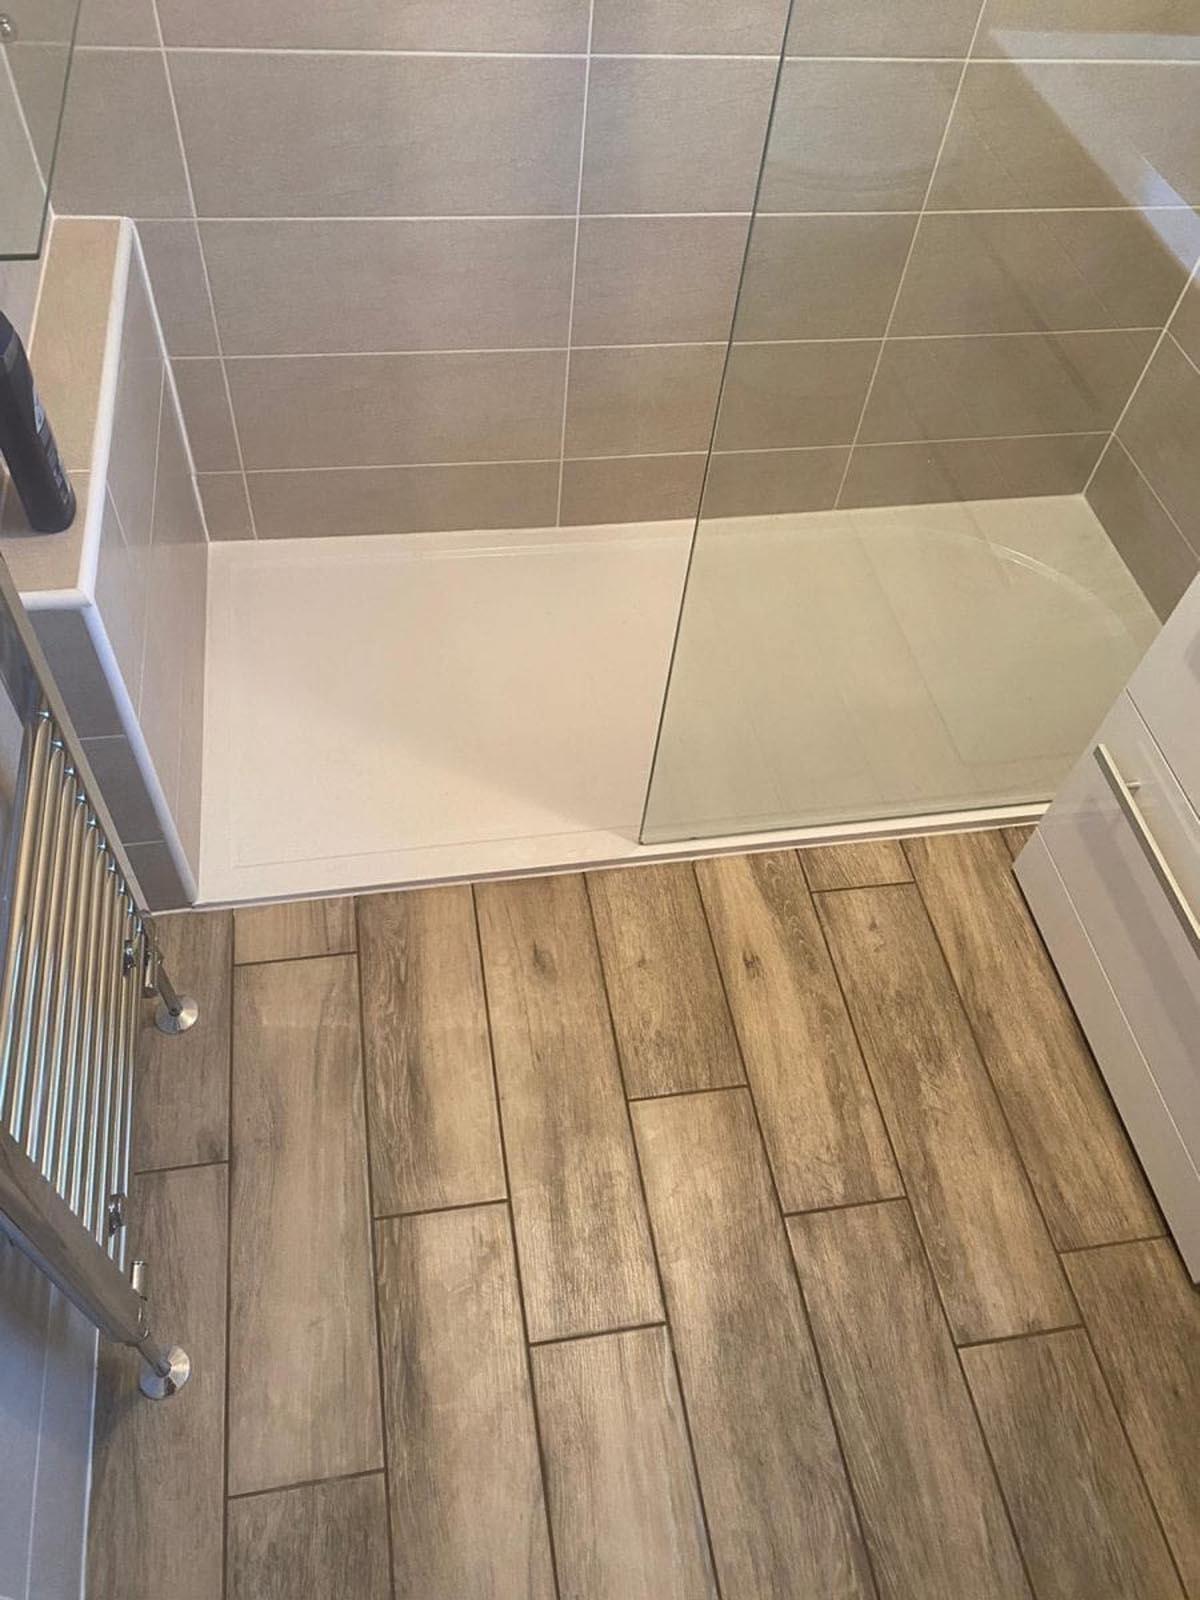 Mr and Mrs Stanniland's Bathroom Renovation